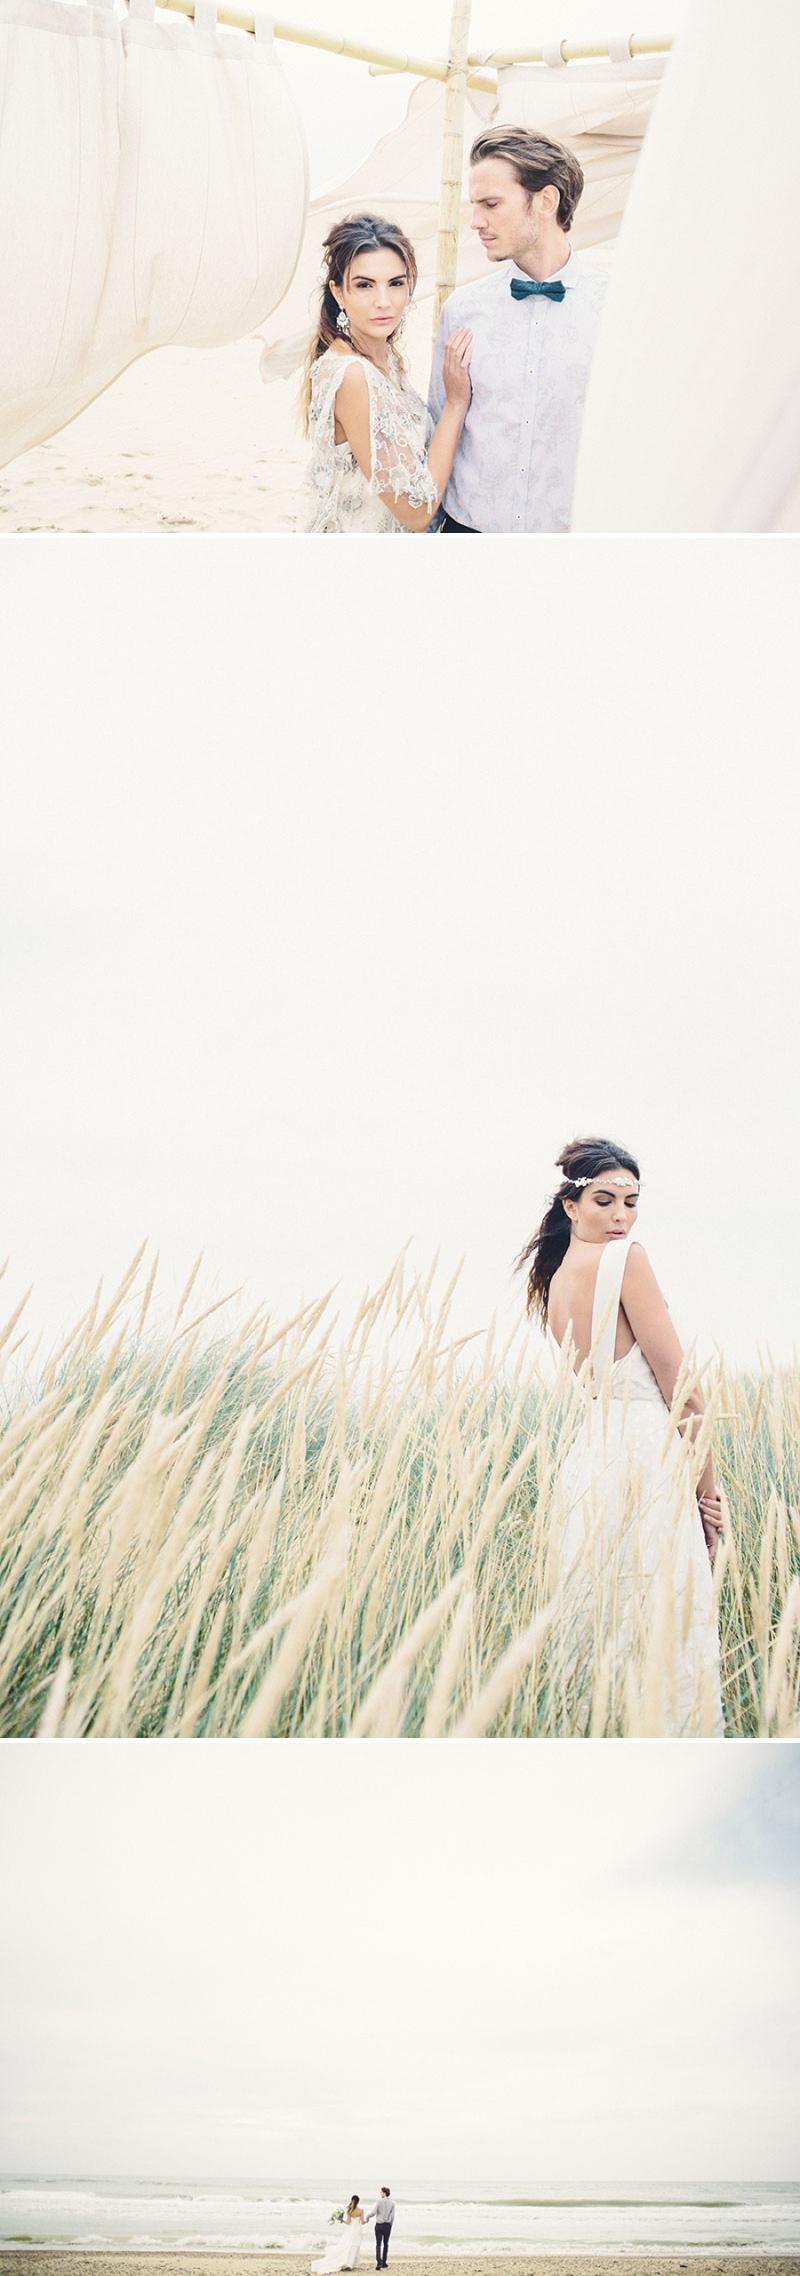 Mermaid wedding inspiration at Camber Sands by Gary Lashmar_0245